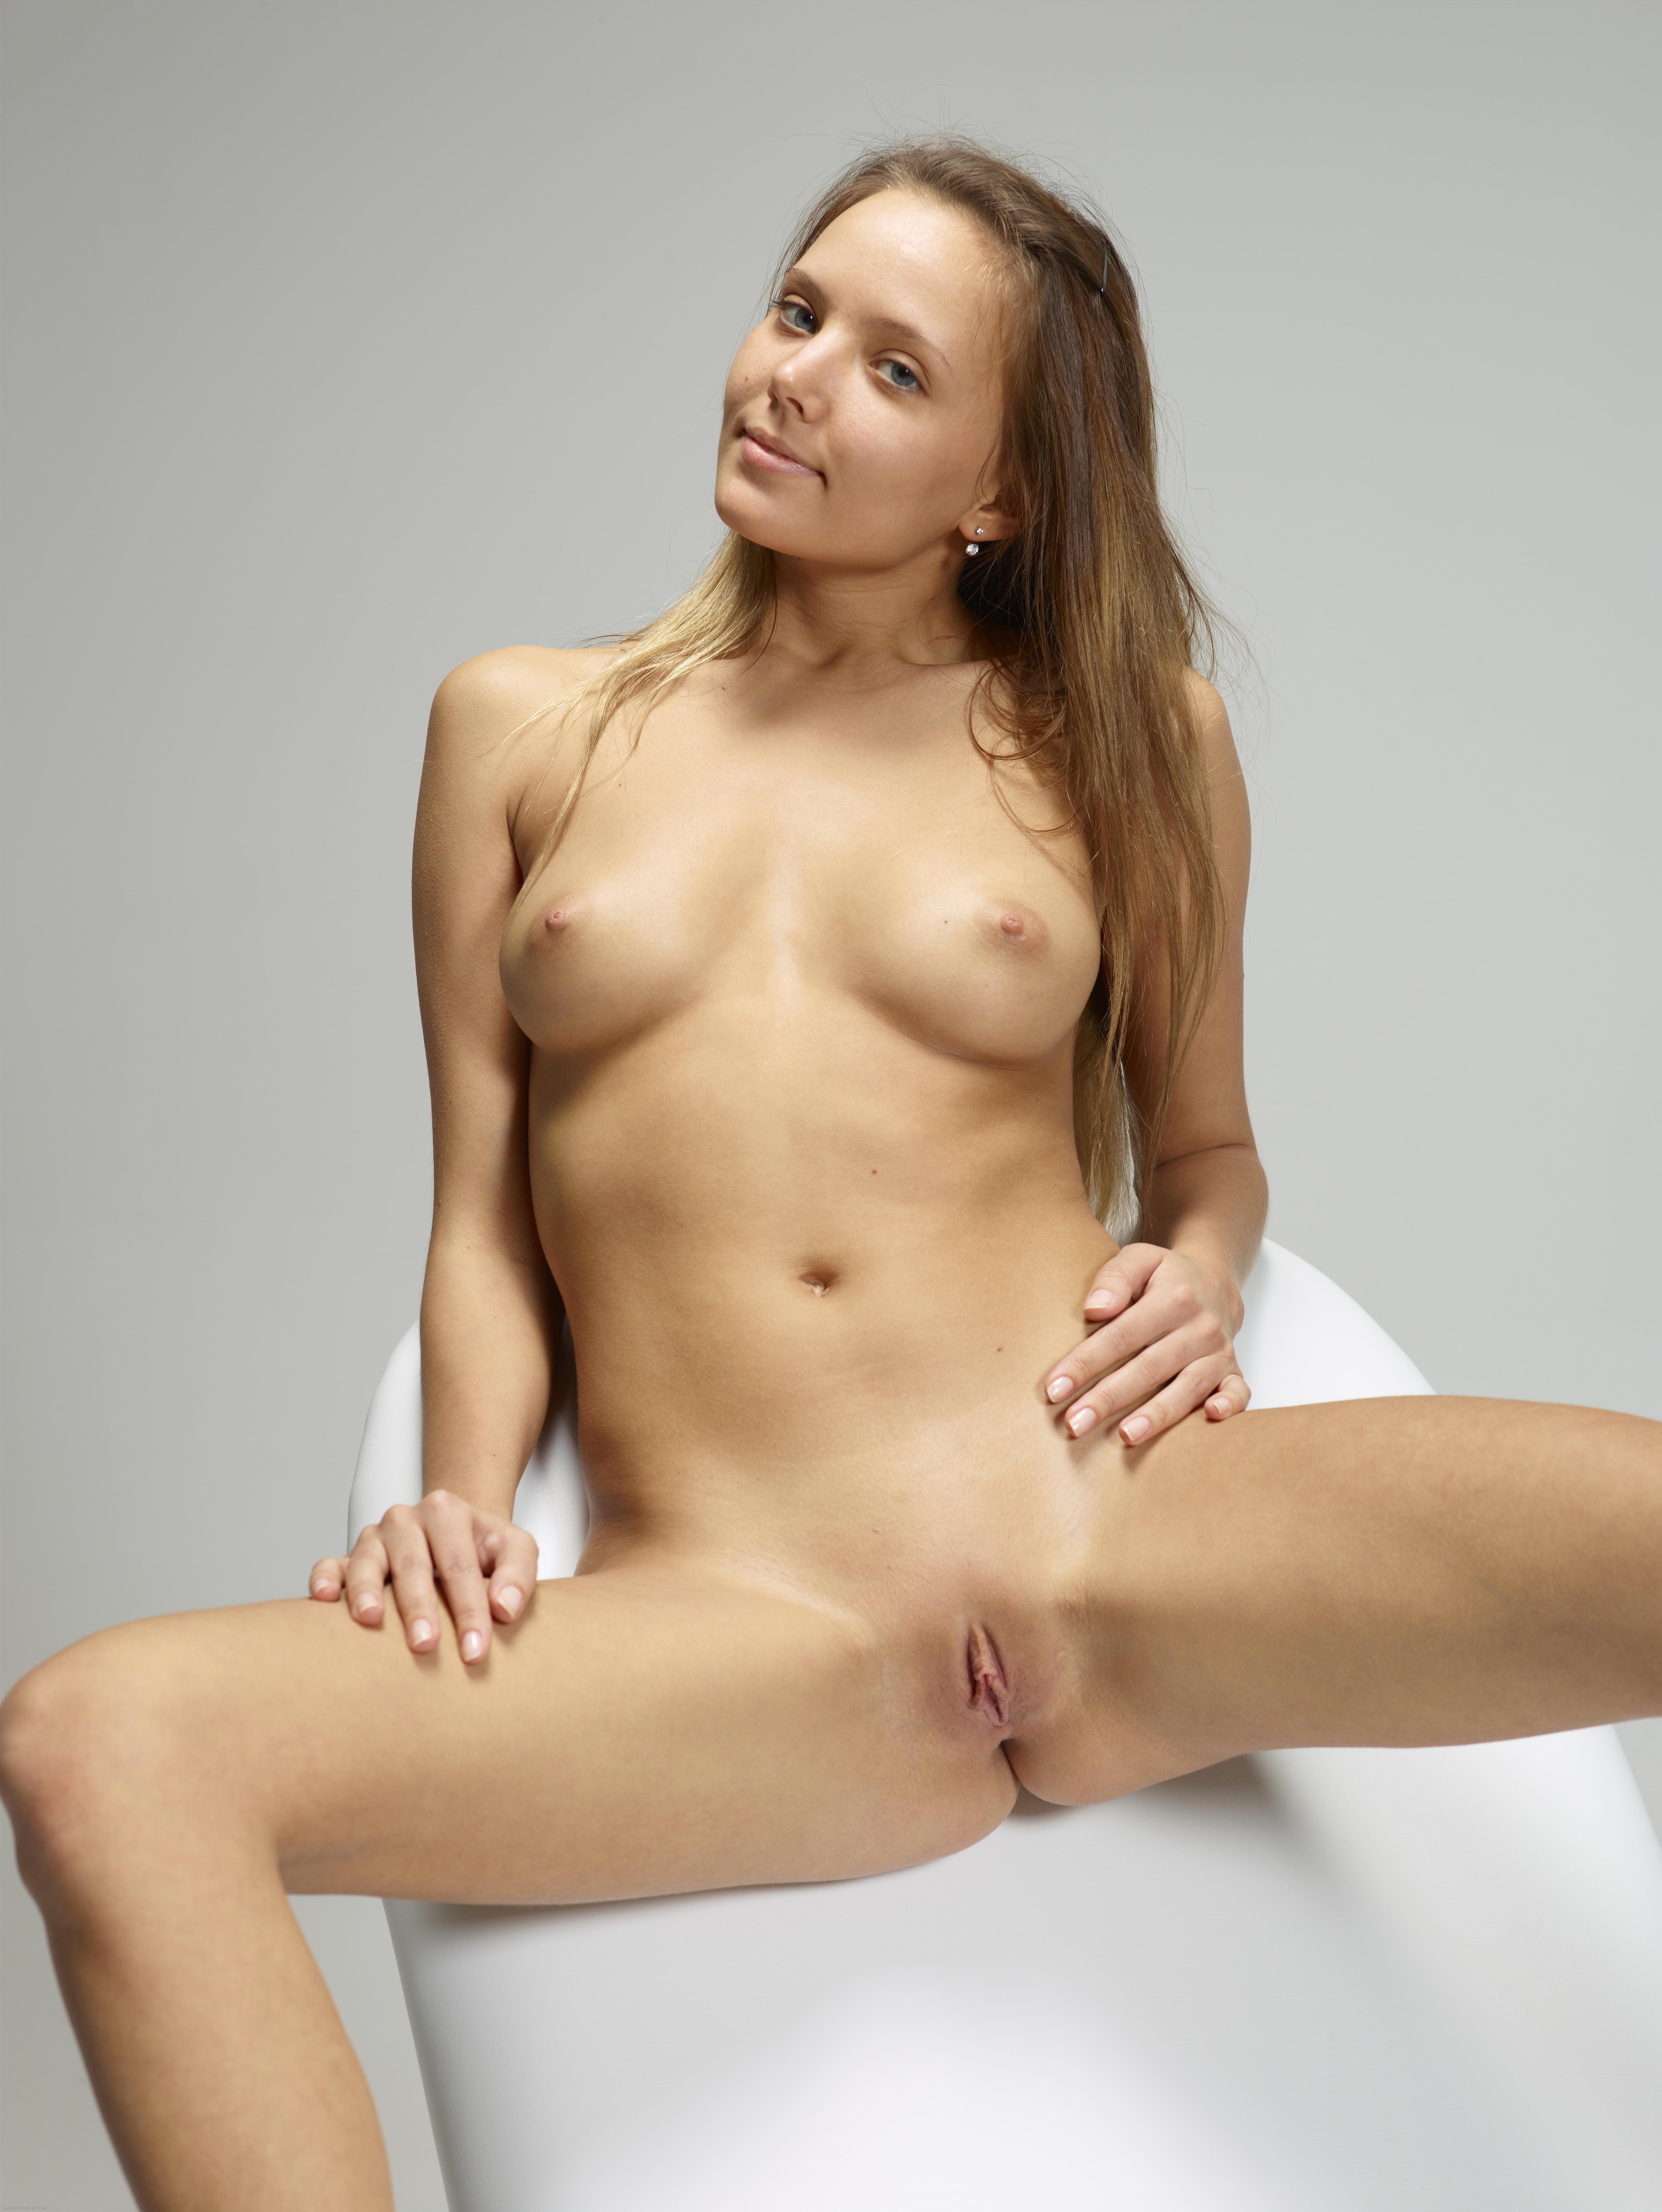 100 gratis online dating sites fetish video søk